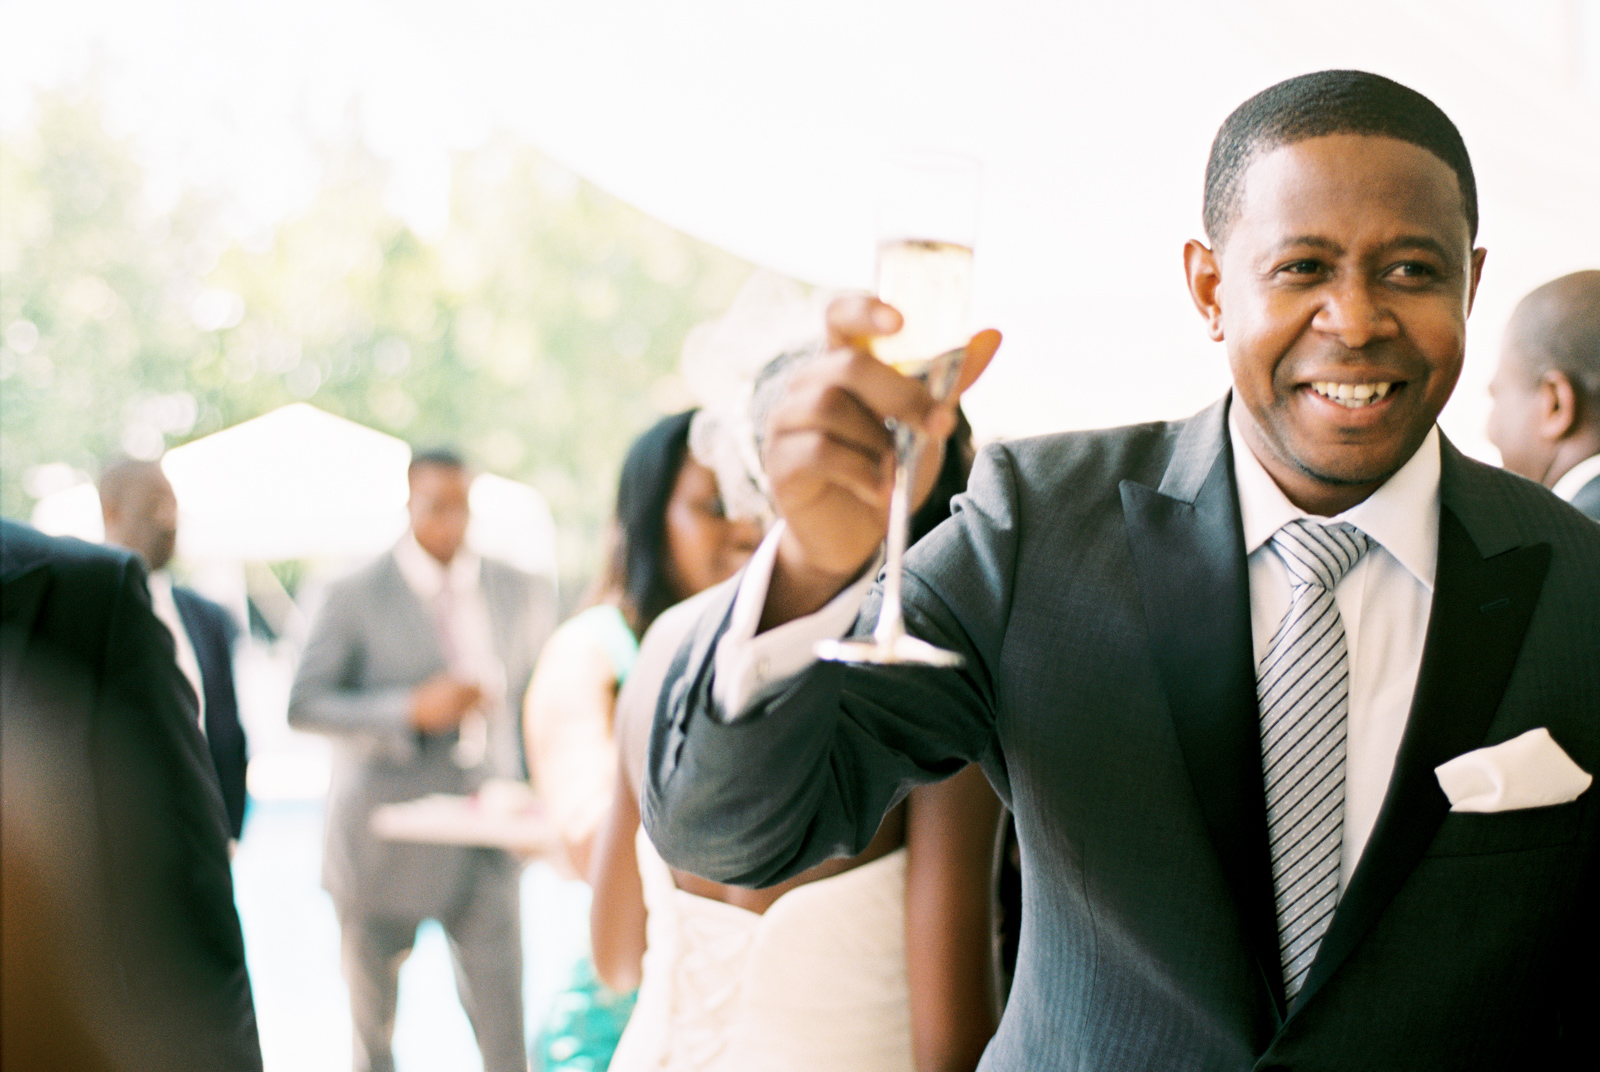 0051_Royal_Oaks_Country_Club_Wedding.jpg